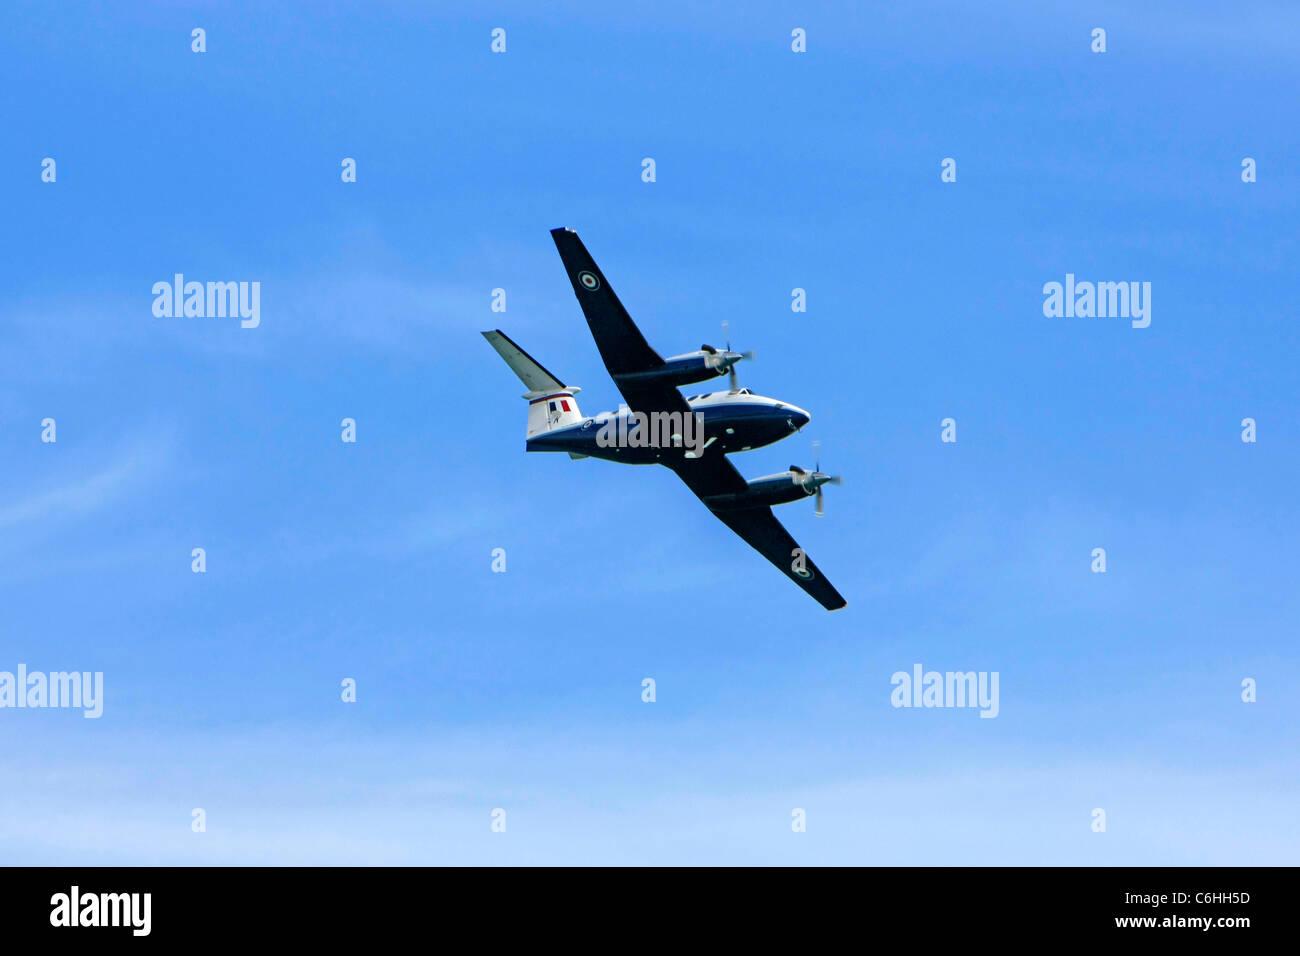 A Beechcraft King Air 350 Turboprop plane - Stock Image